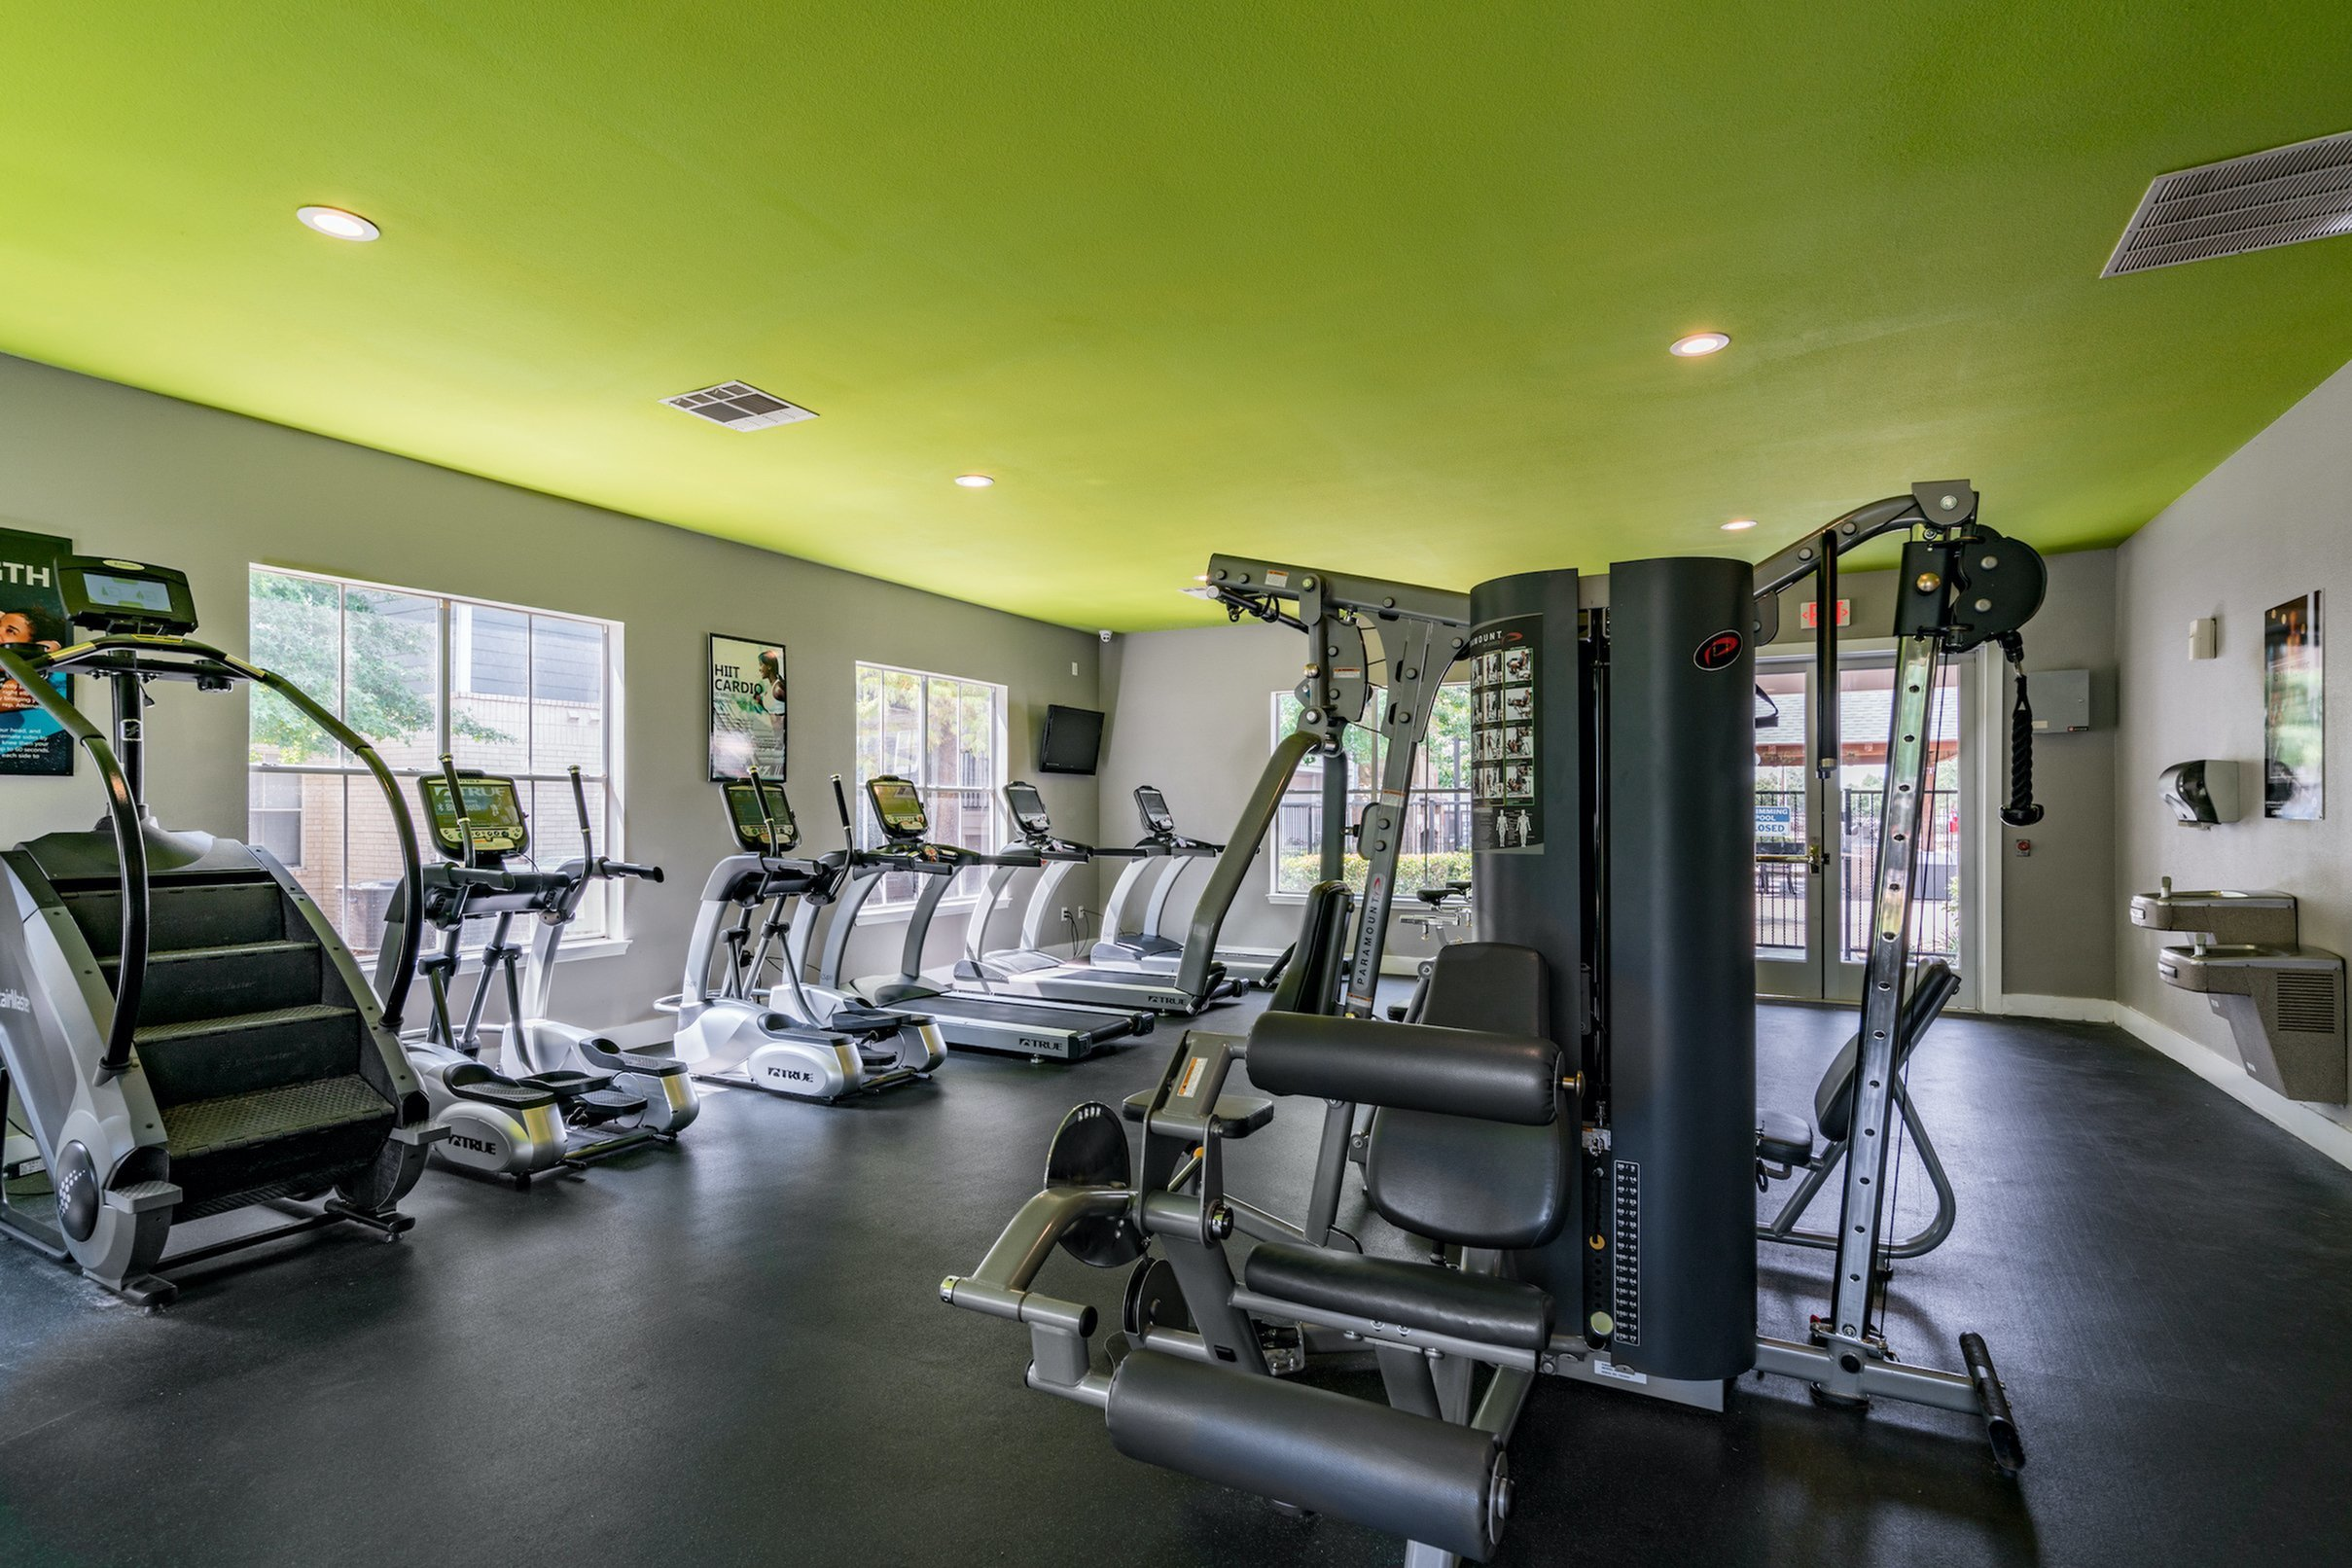 State-of-the-Art Fitness Center | Apartment Homes in Denton, TX | Castlerock at Denton